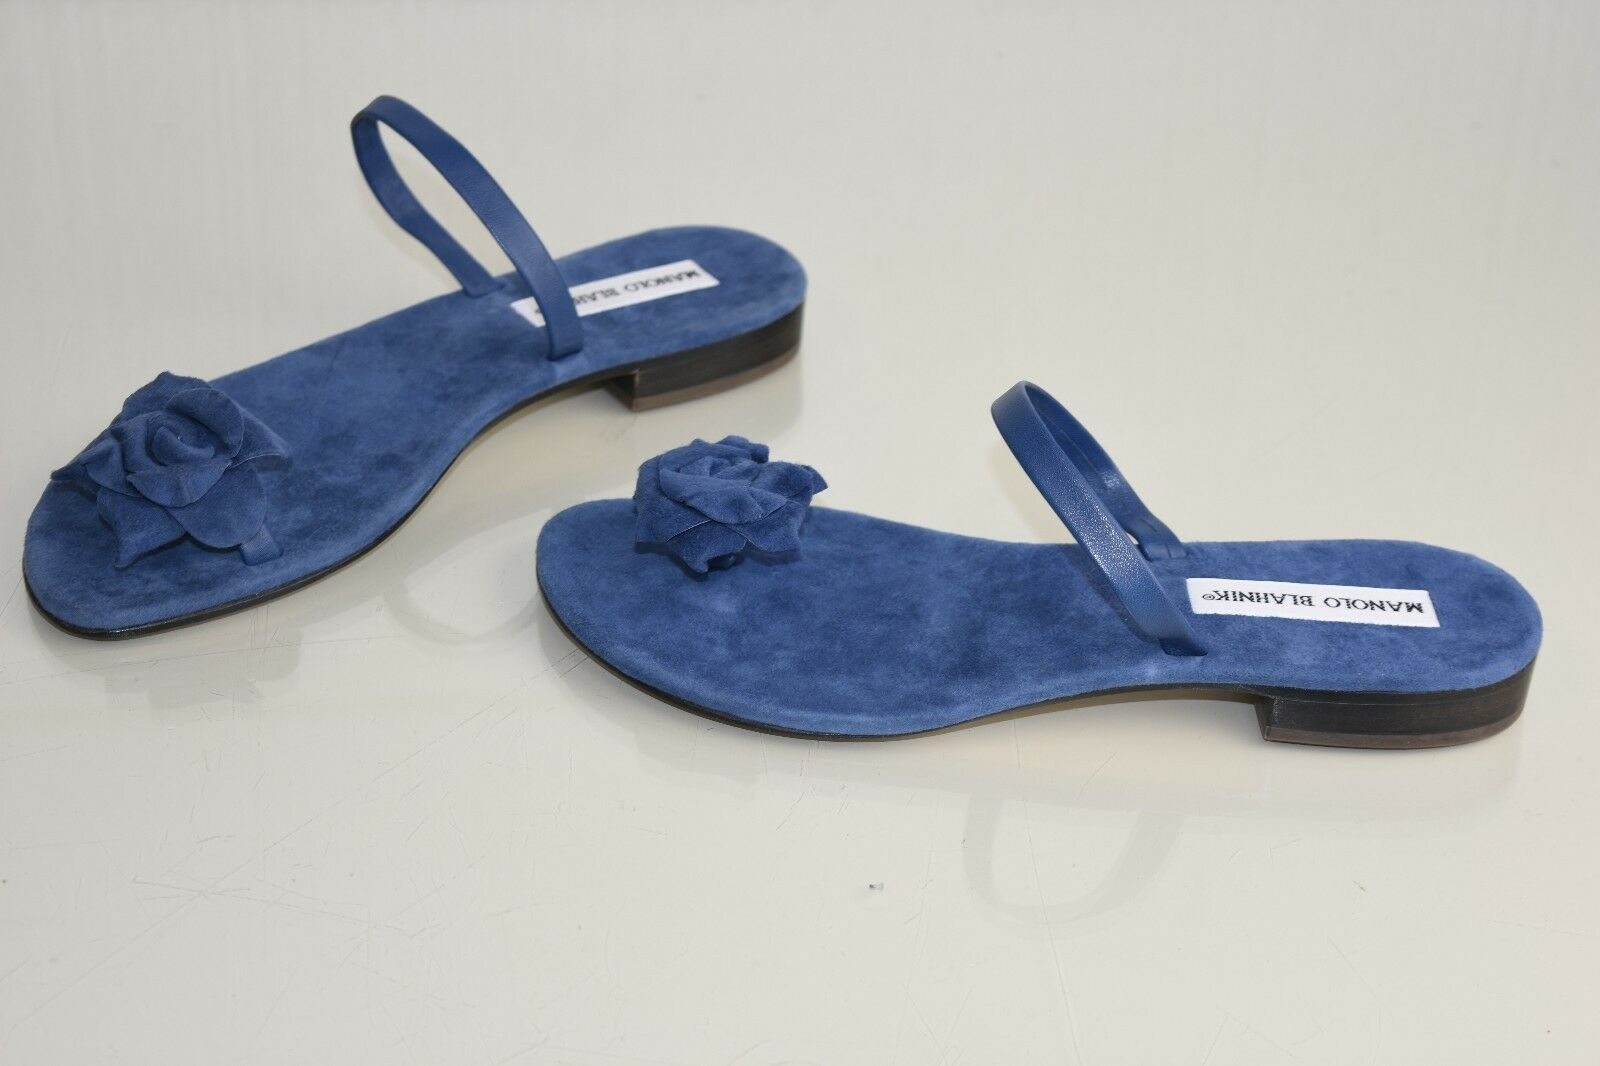 Neuf Manolo Blahnik Camellia Indigo Sandales Bleu Marine Glissière Glissière Glissière Tongs 557241